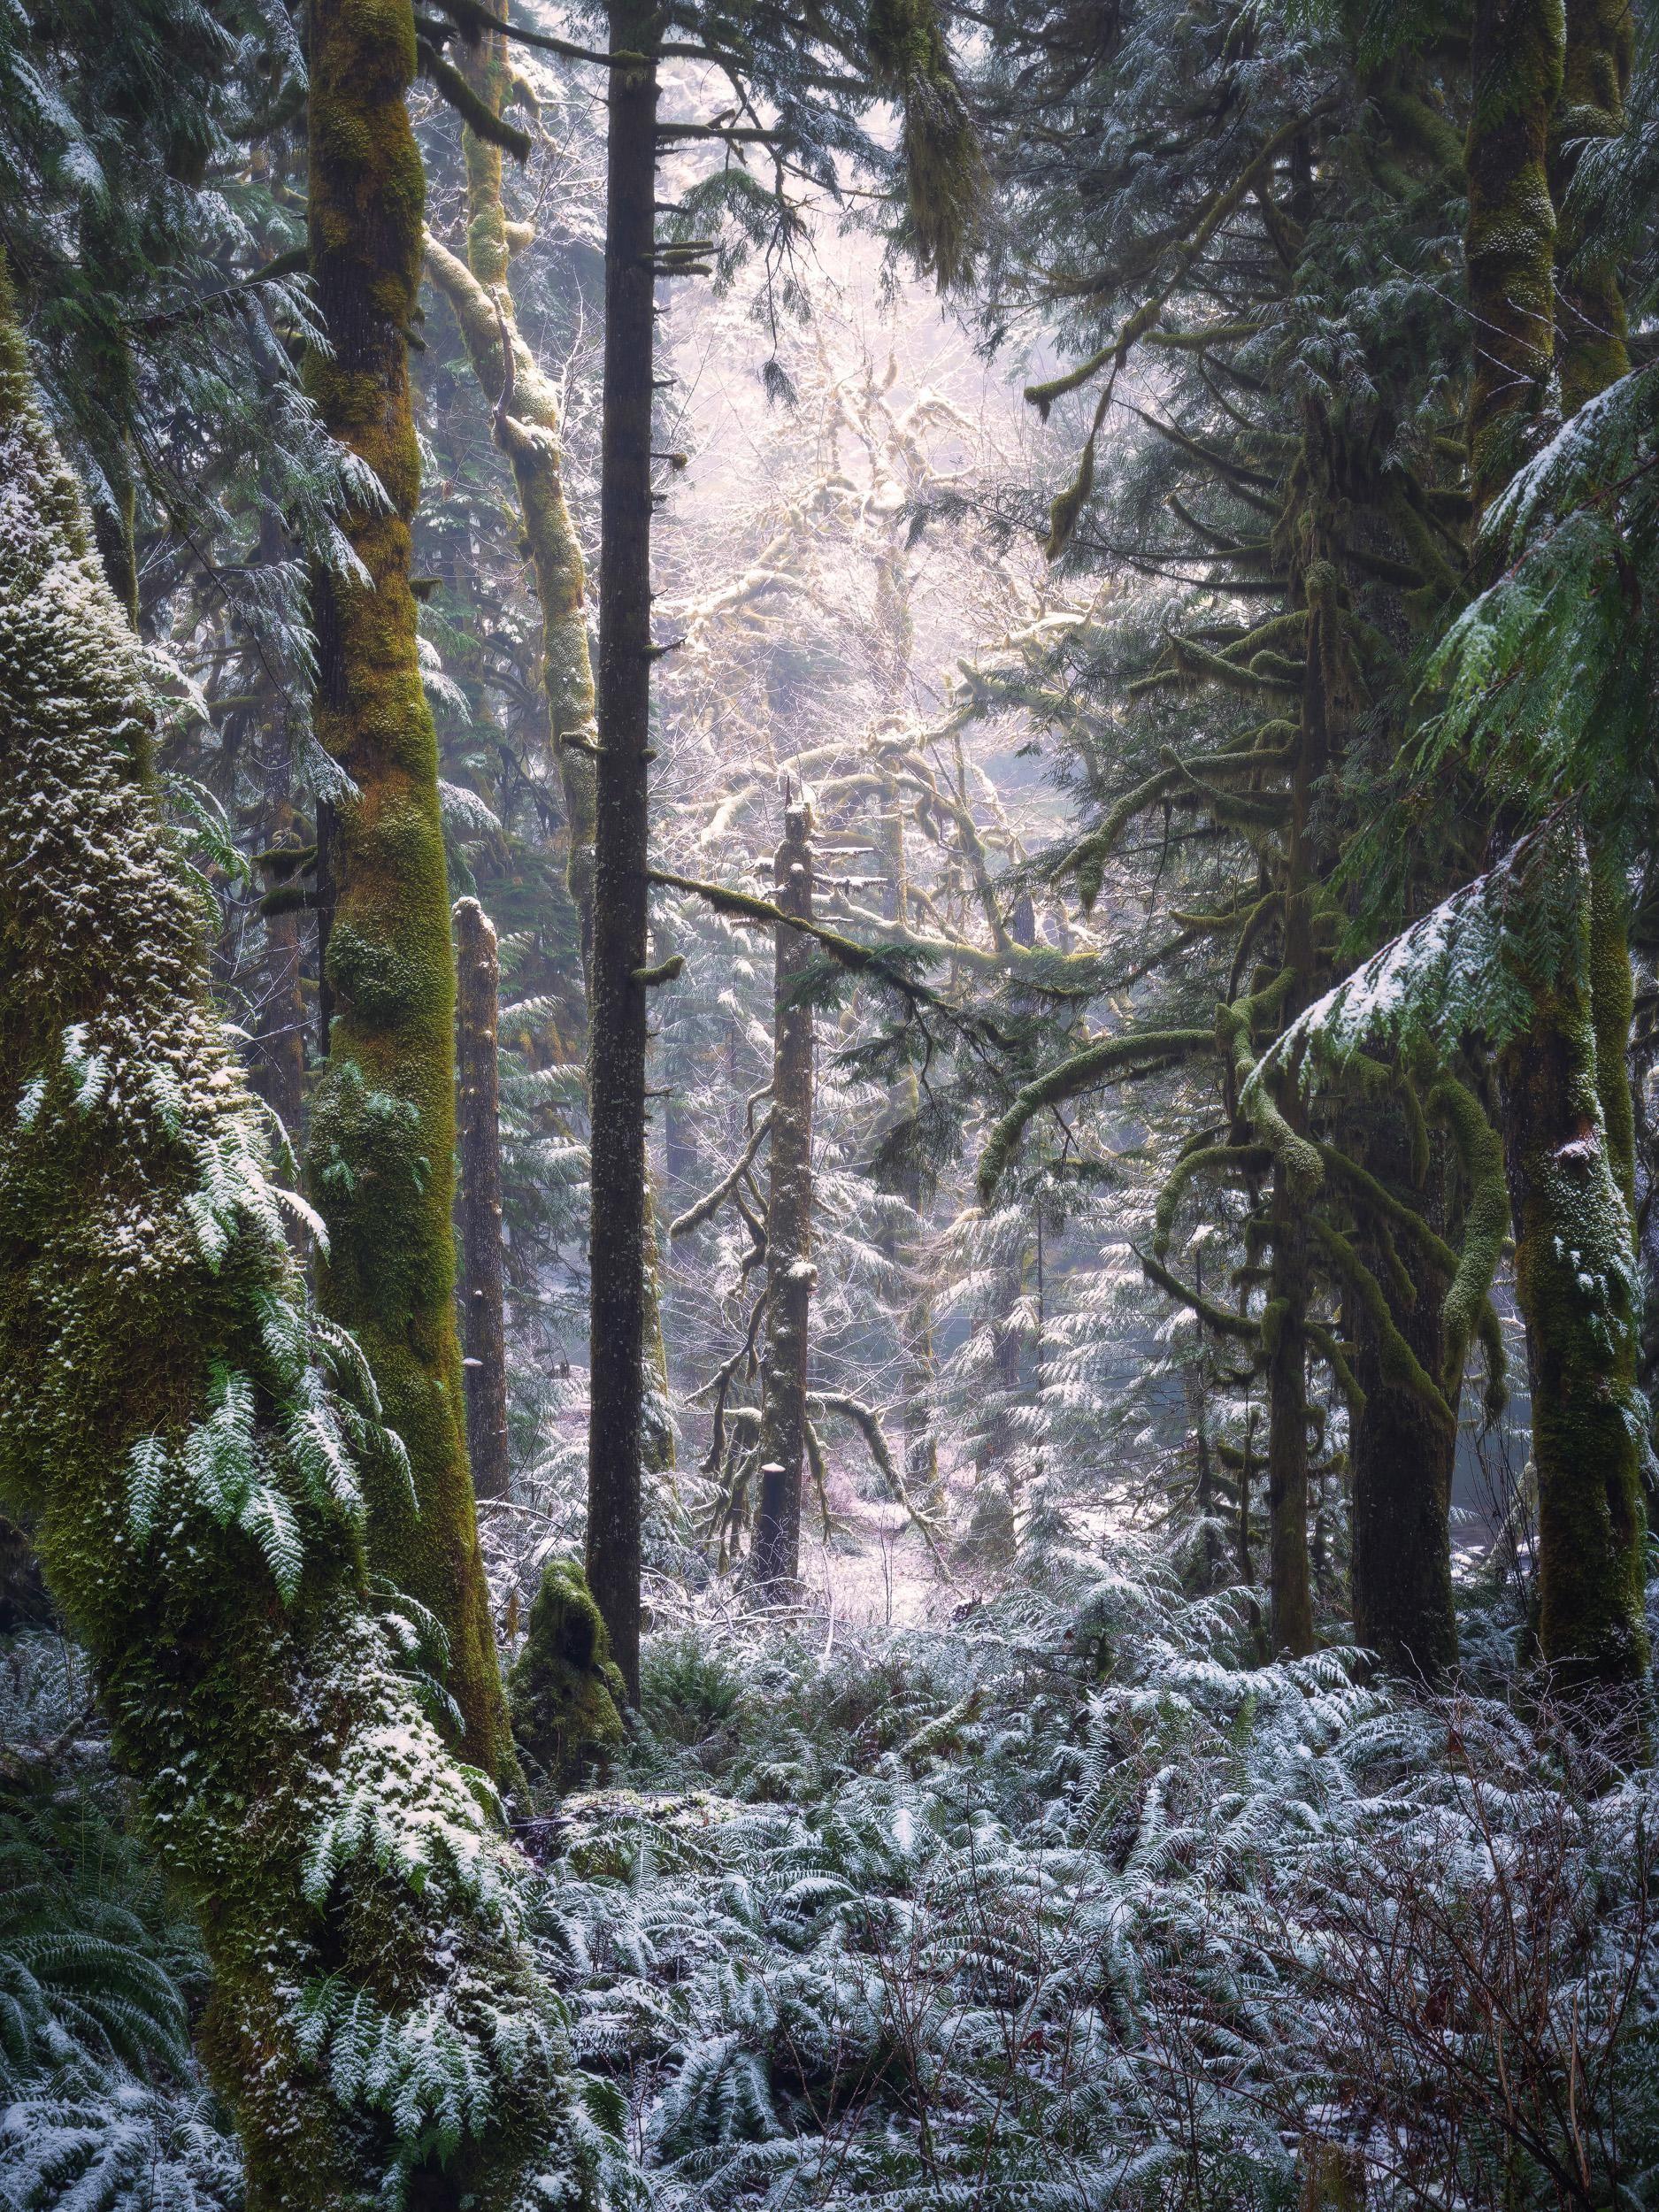 Salmon River Trail Oregon. [1875 x 2500] [OC] JustinPoe